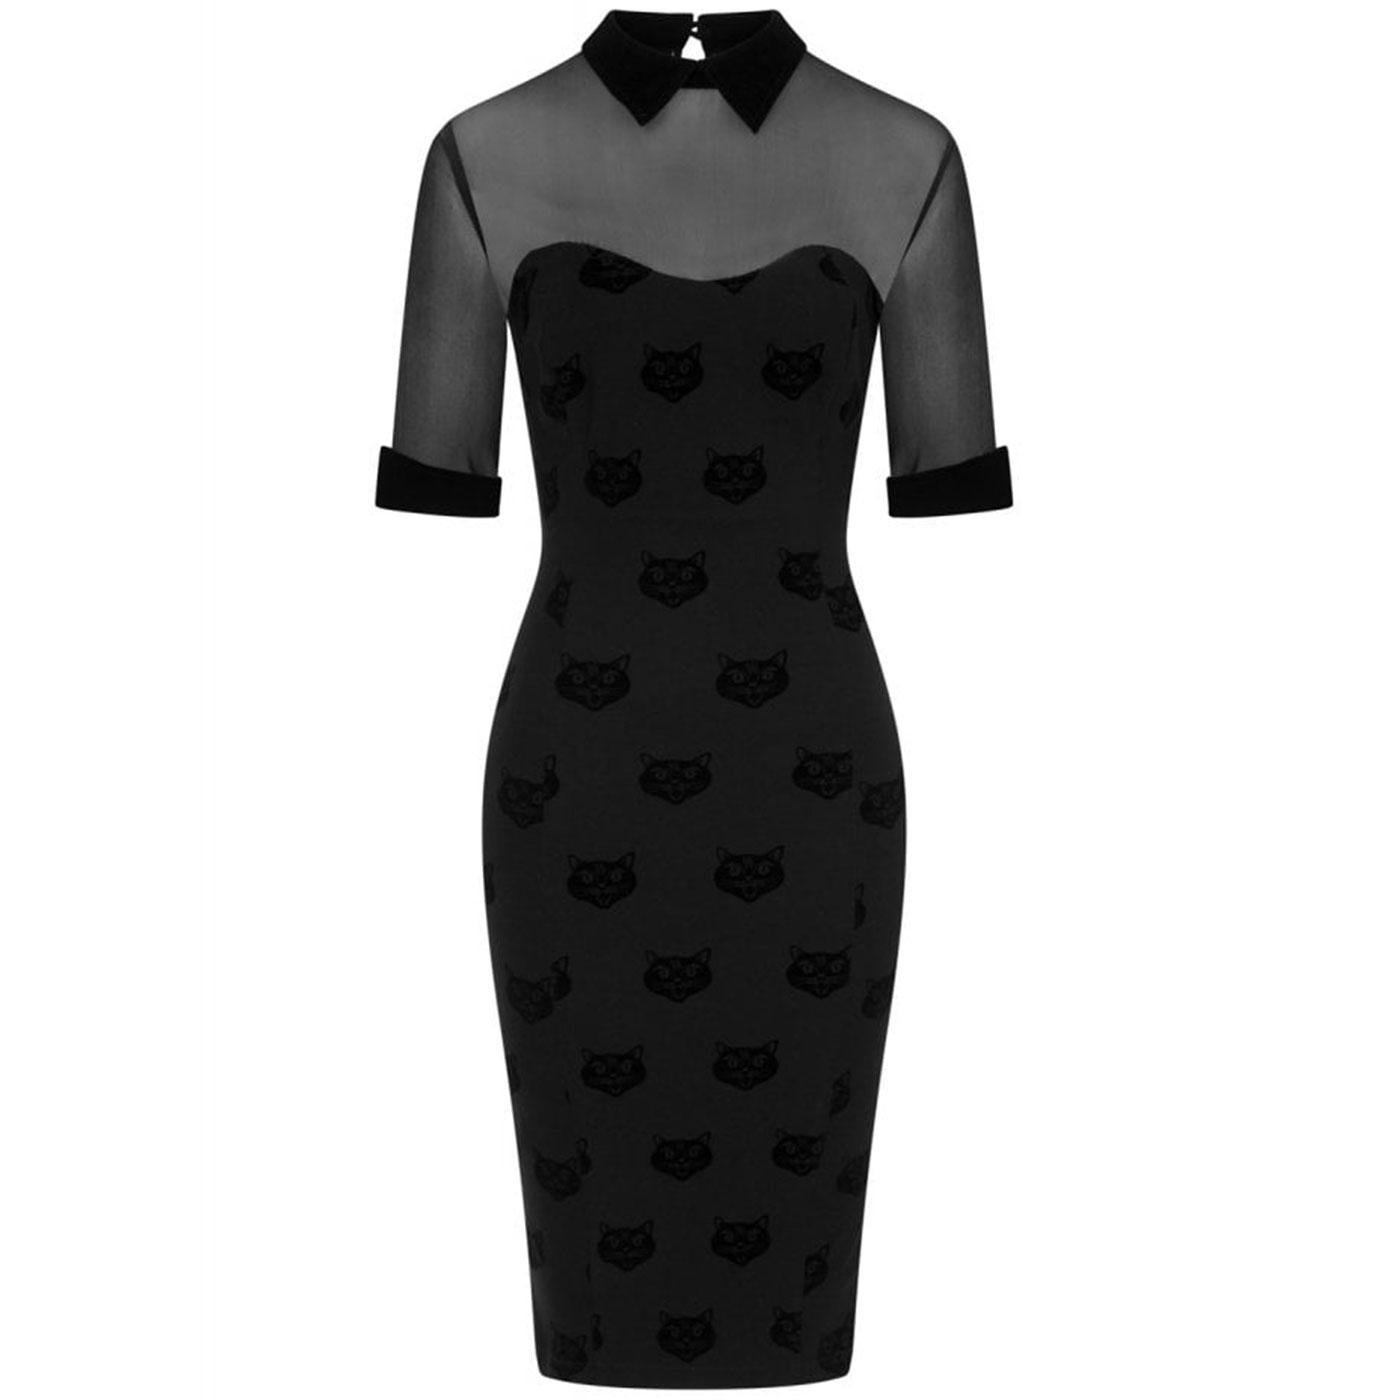 Wednesday COLLECTIF Velvet Cat Pencil Dress Black